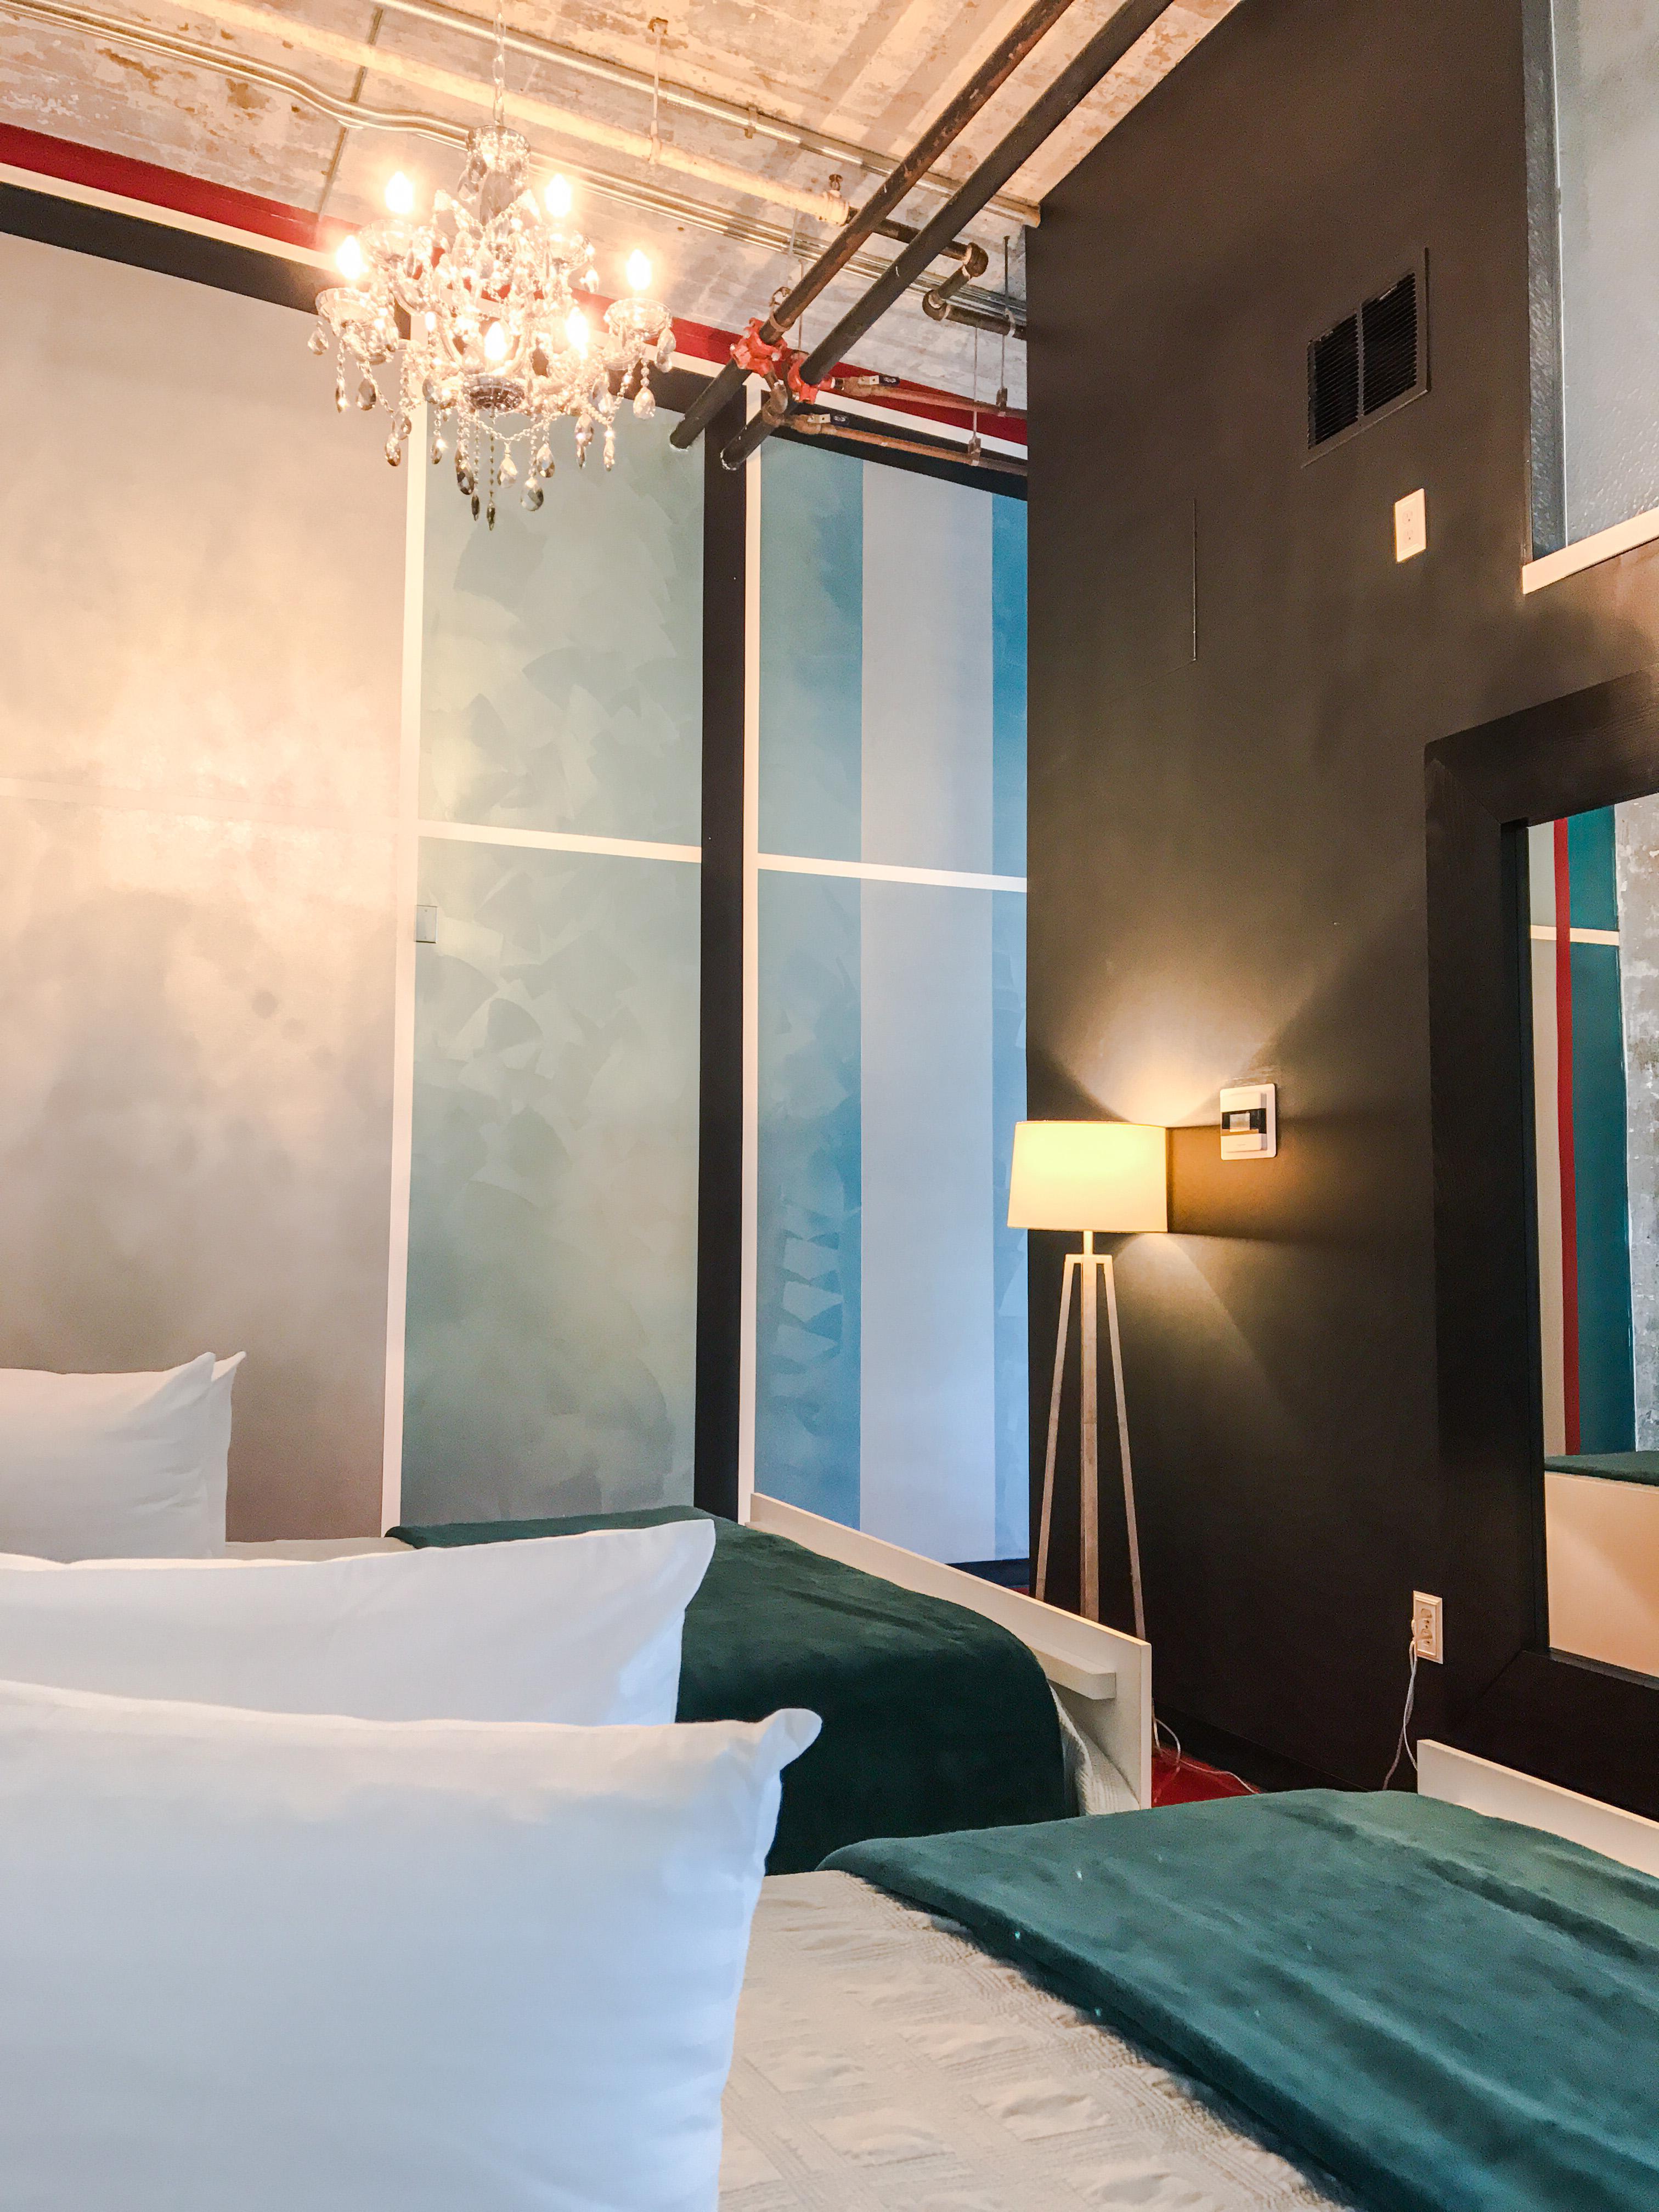 Loft Reverie Hotel 809 - Airy Open Floorplan + Queen Memory Foam Beds